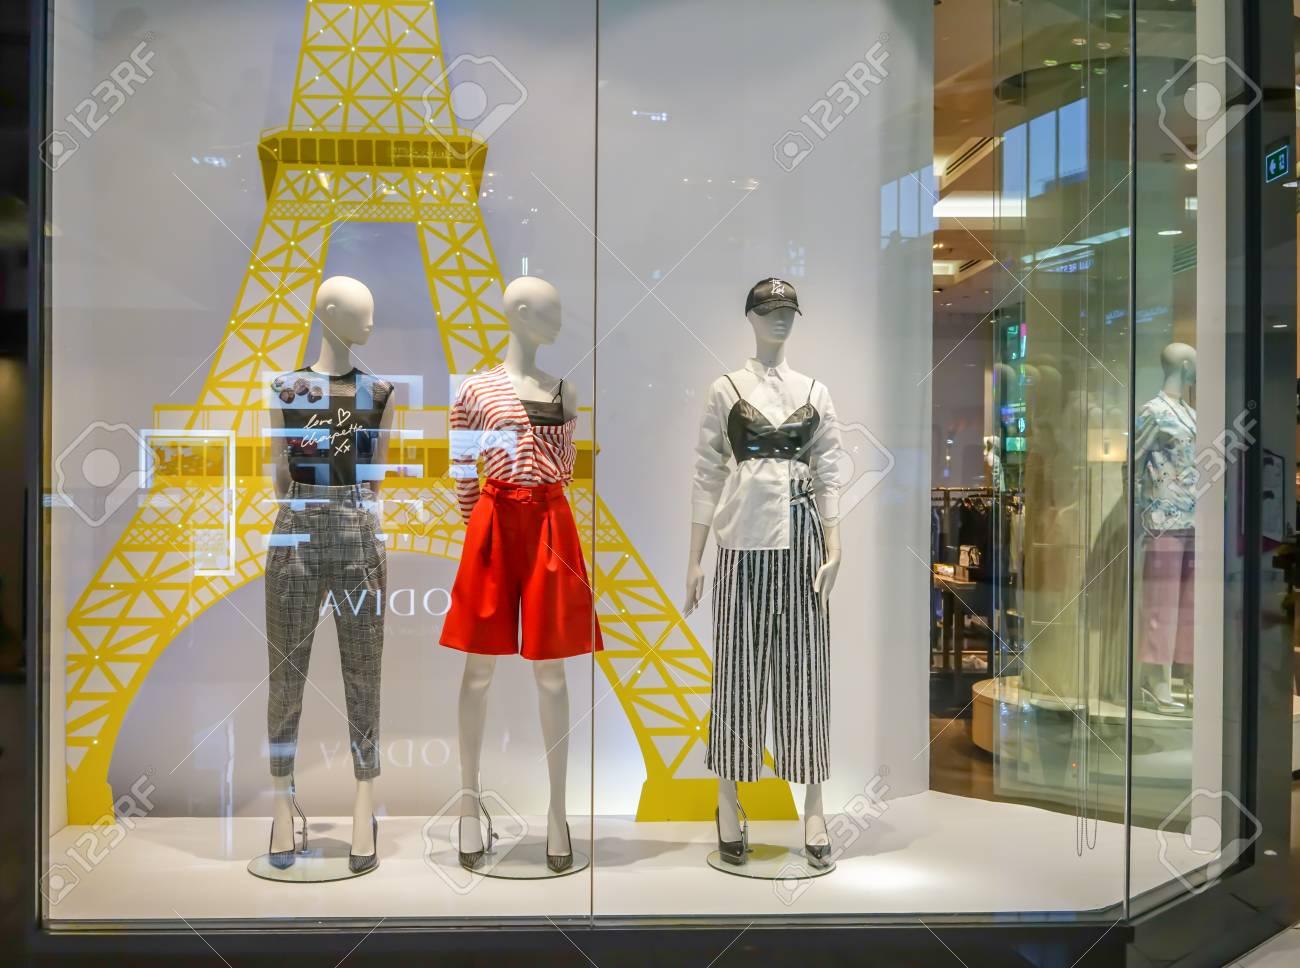 d4306e18 Stock Photo - Jaspal shop at Mega Bangna, Bangkok, Thailand, Jun 2, 2018 :  Fashionable brand window display. New collection of modern classic  clothings ...